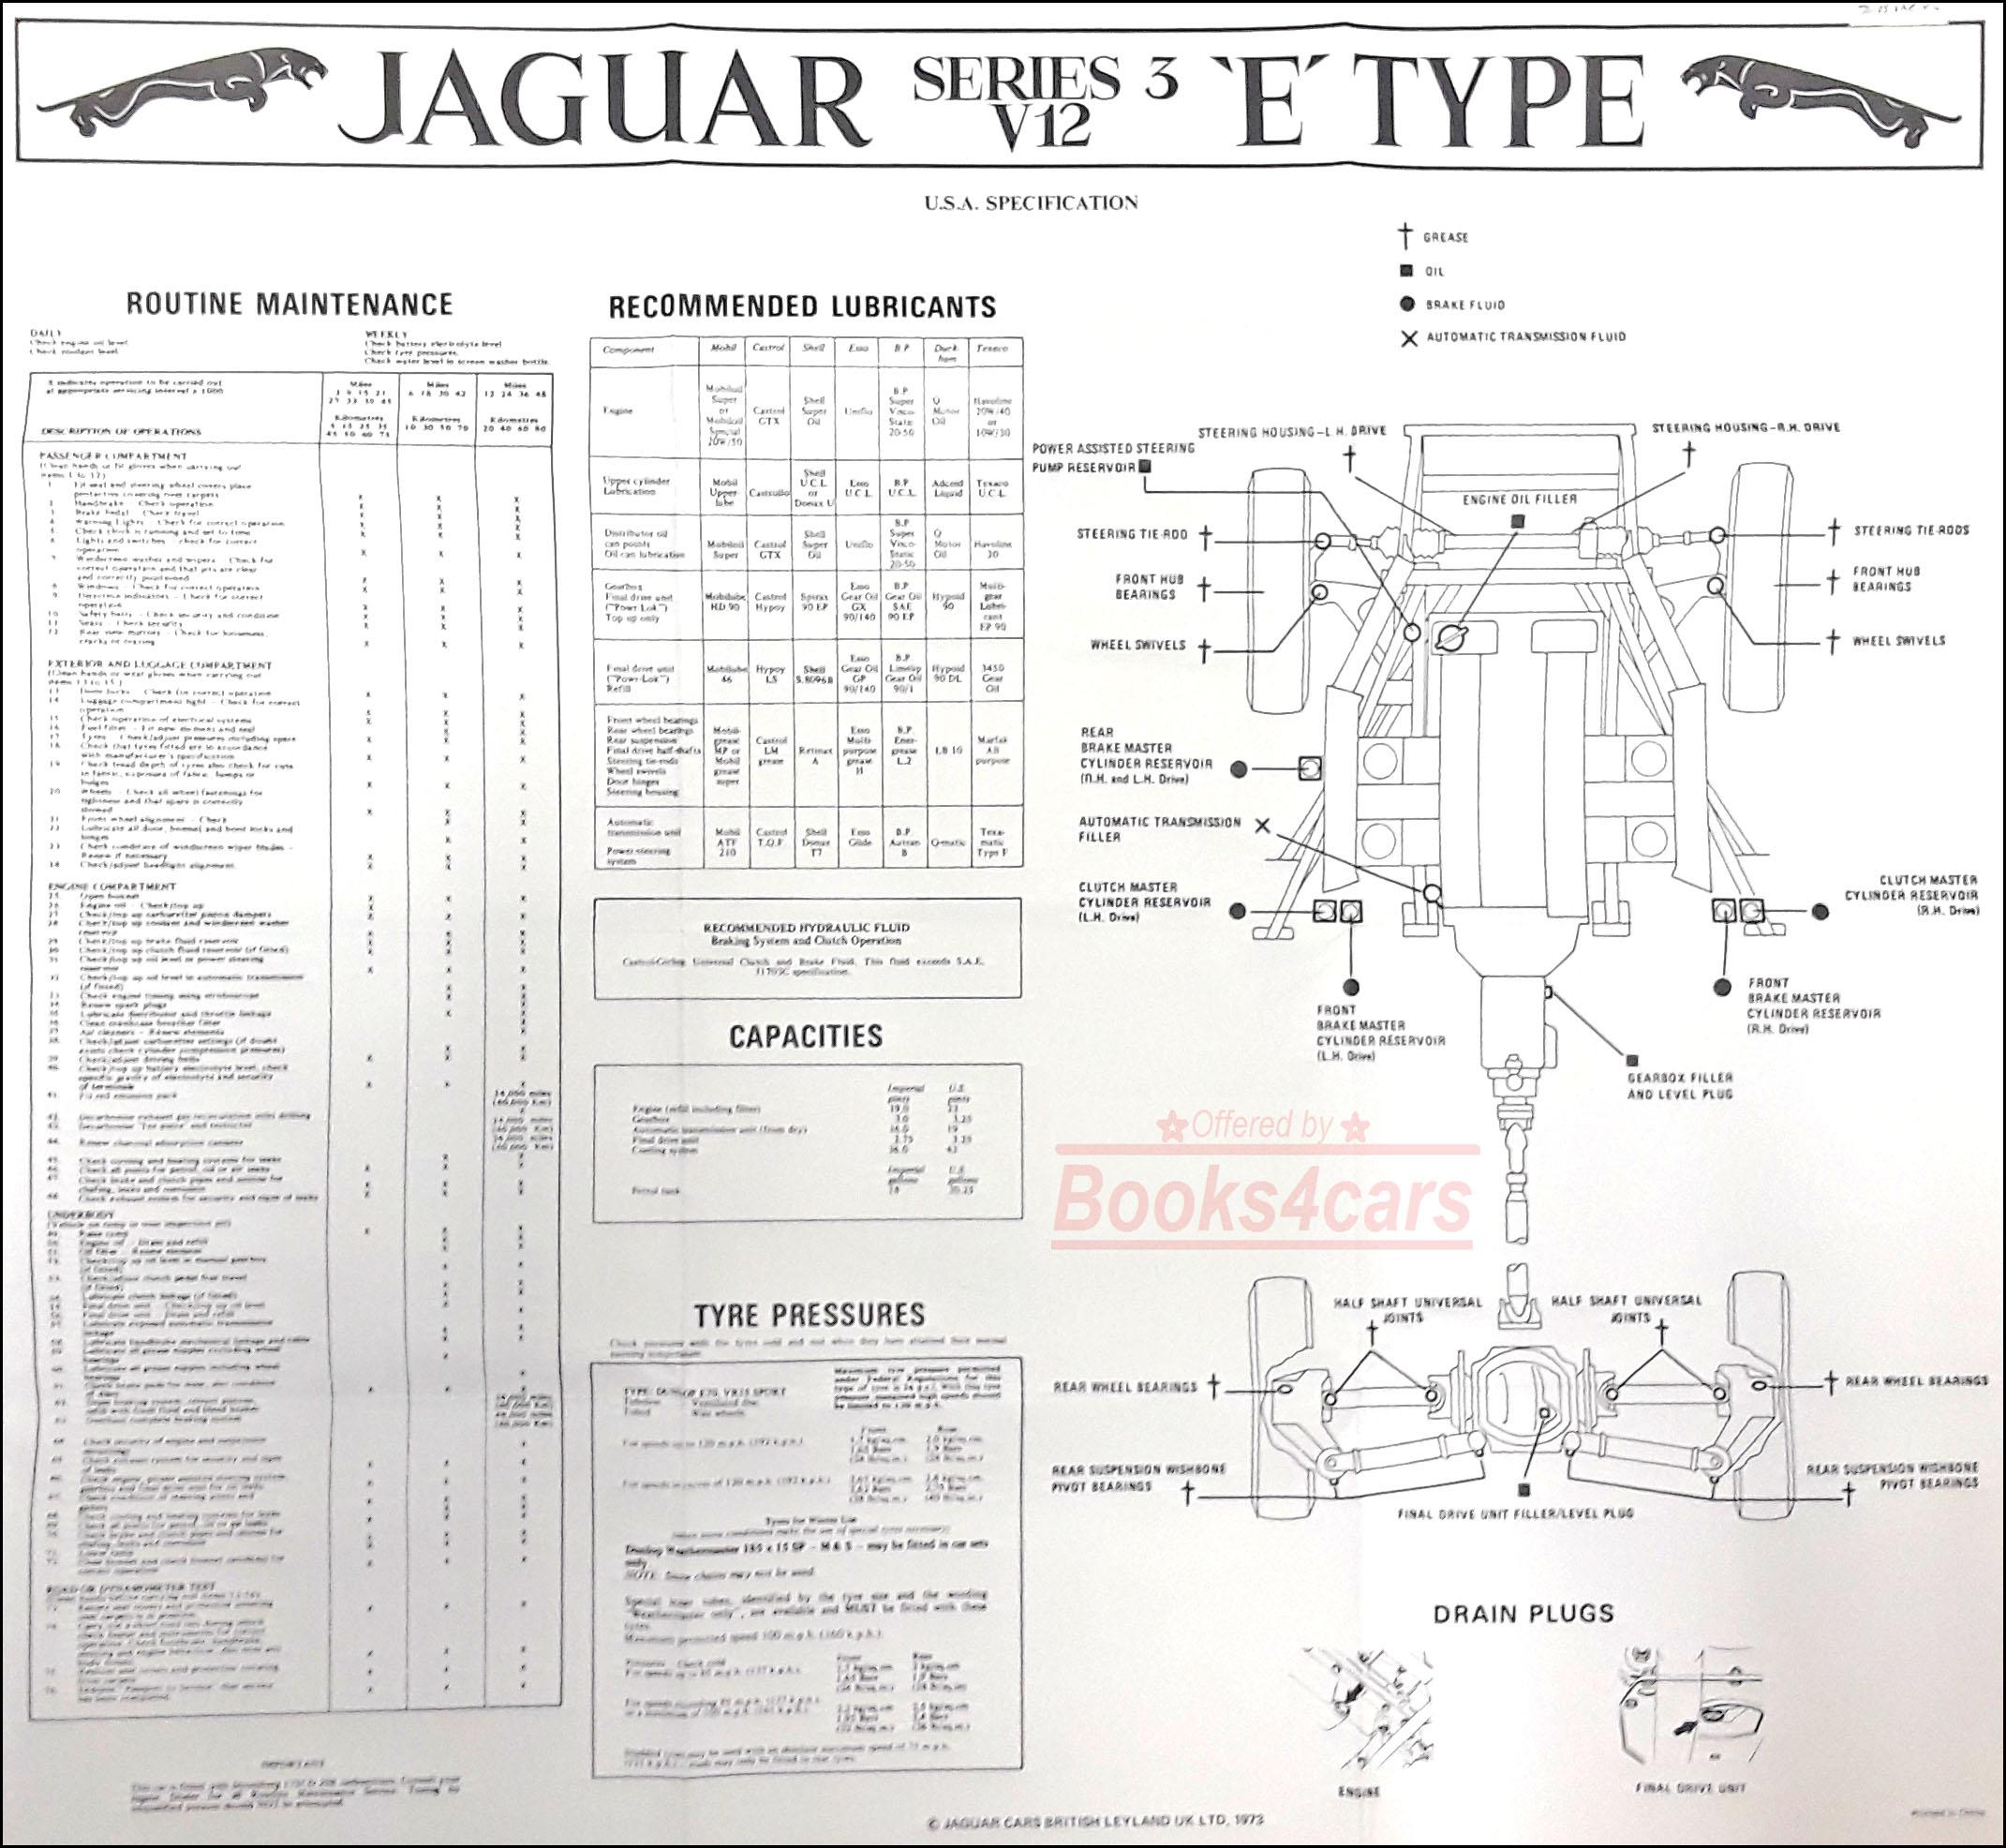 Jaguar E Type S3 Wiring Diagram Auto Electrical Wiring Diagram VW Bug Wiring -Diagram Jaguar E Type 3 8 Wiring Diagram